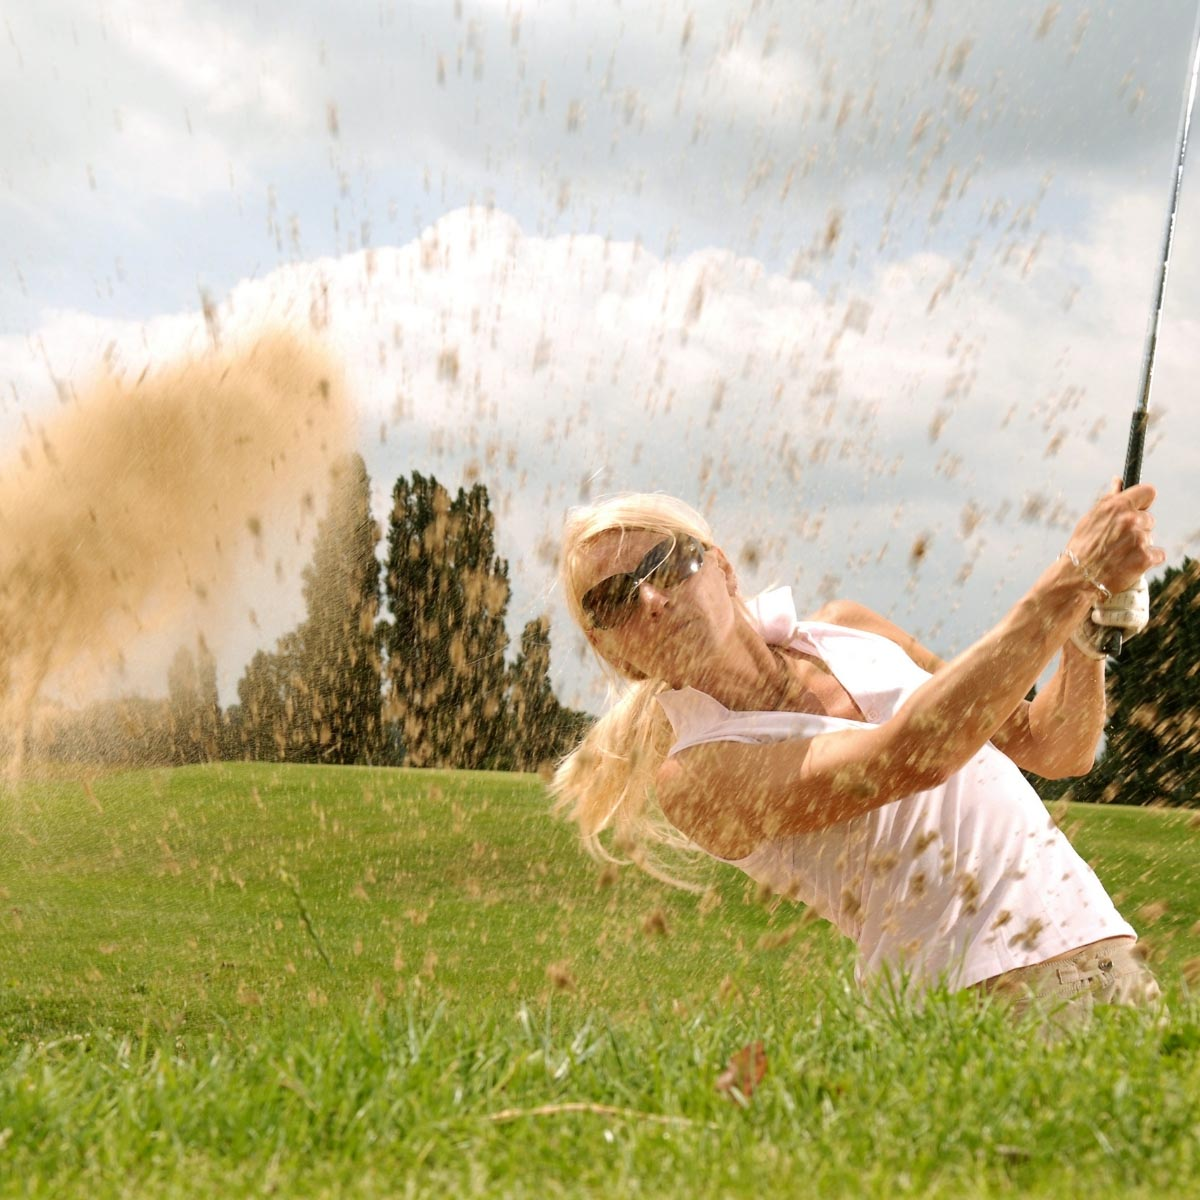 salir al campo de golf